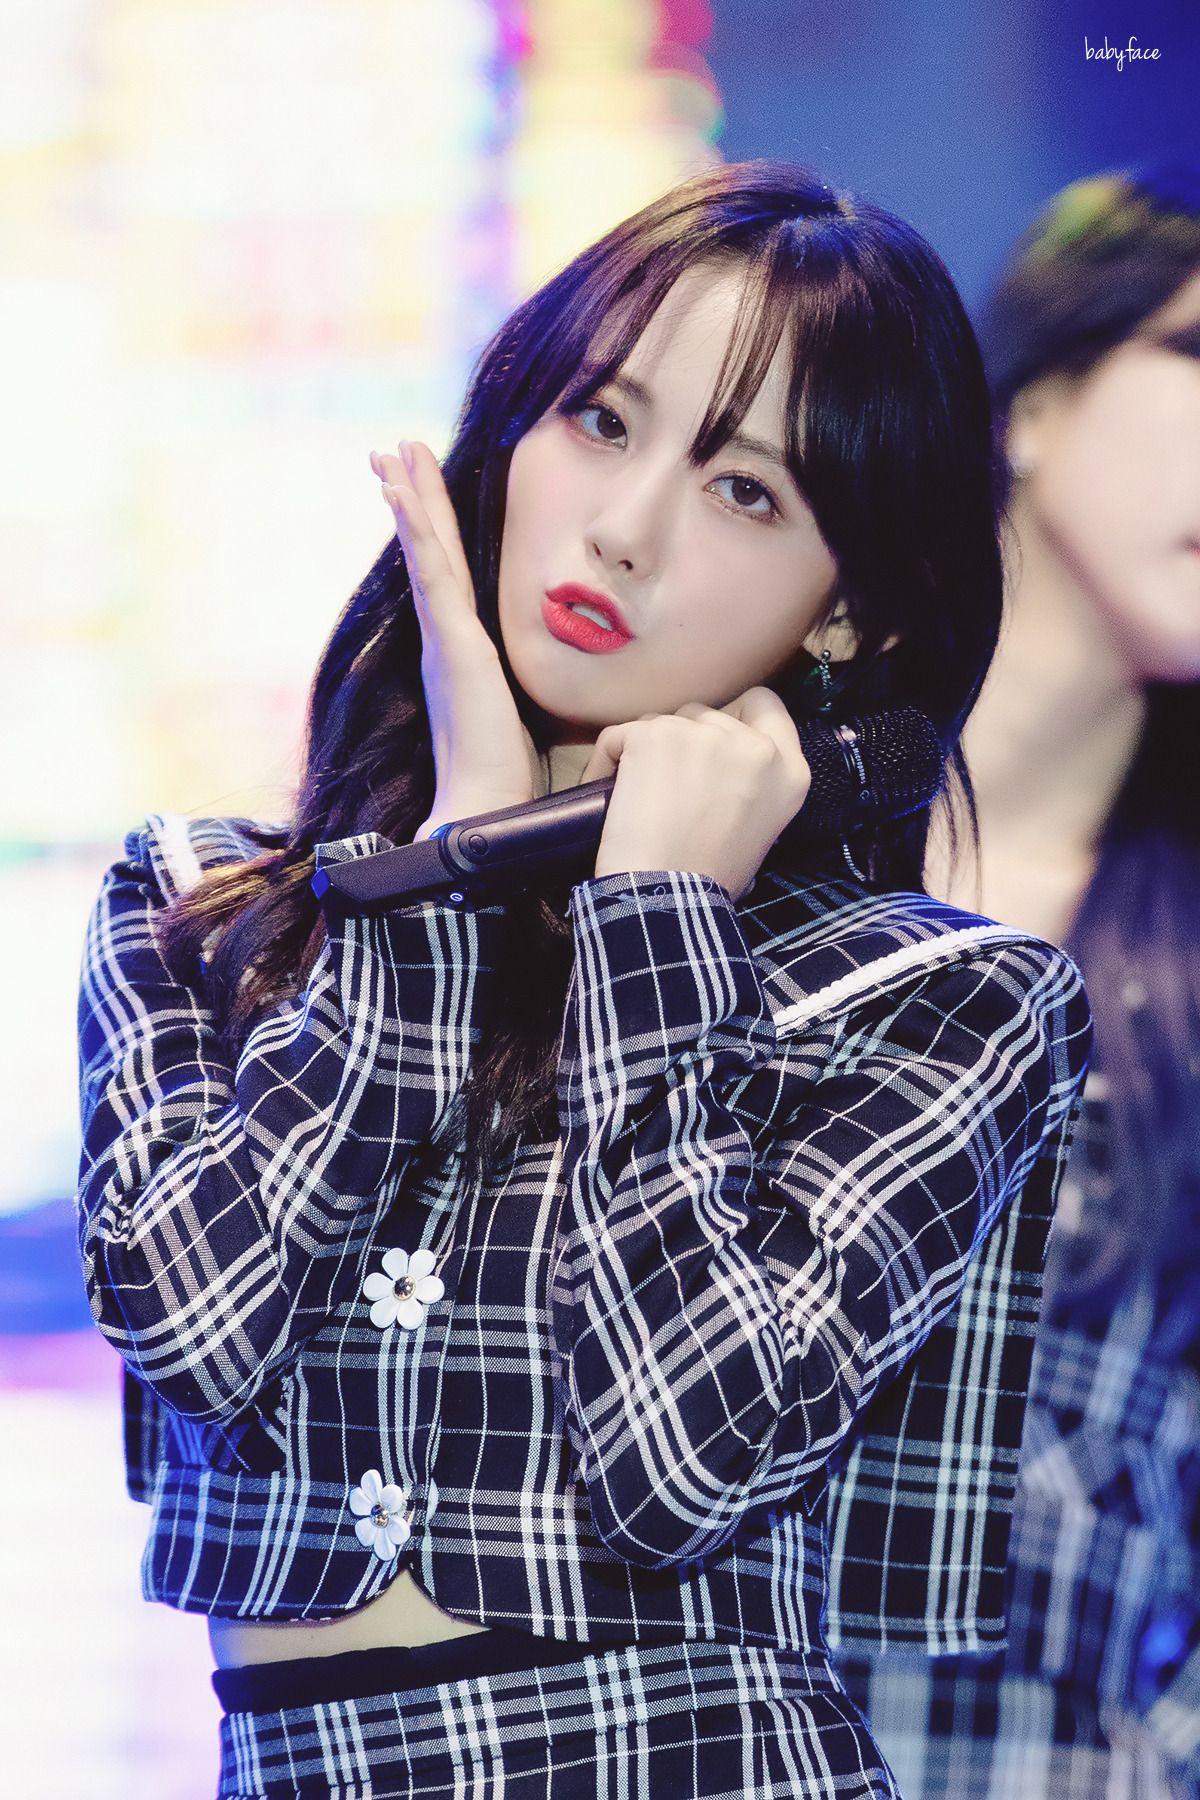 Download All Your Favorite Jpop And Kpop Songs Iomoio Jpop Kpop